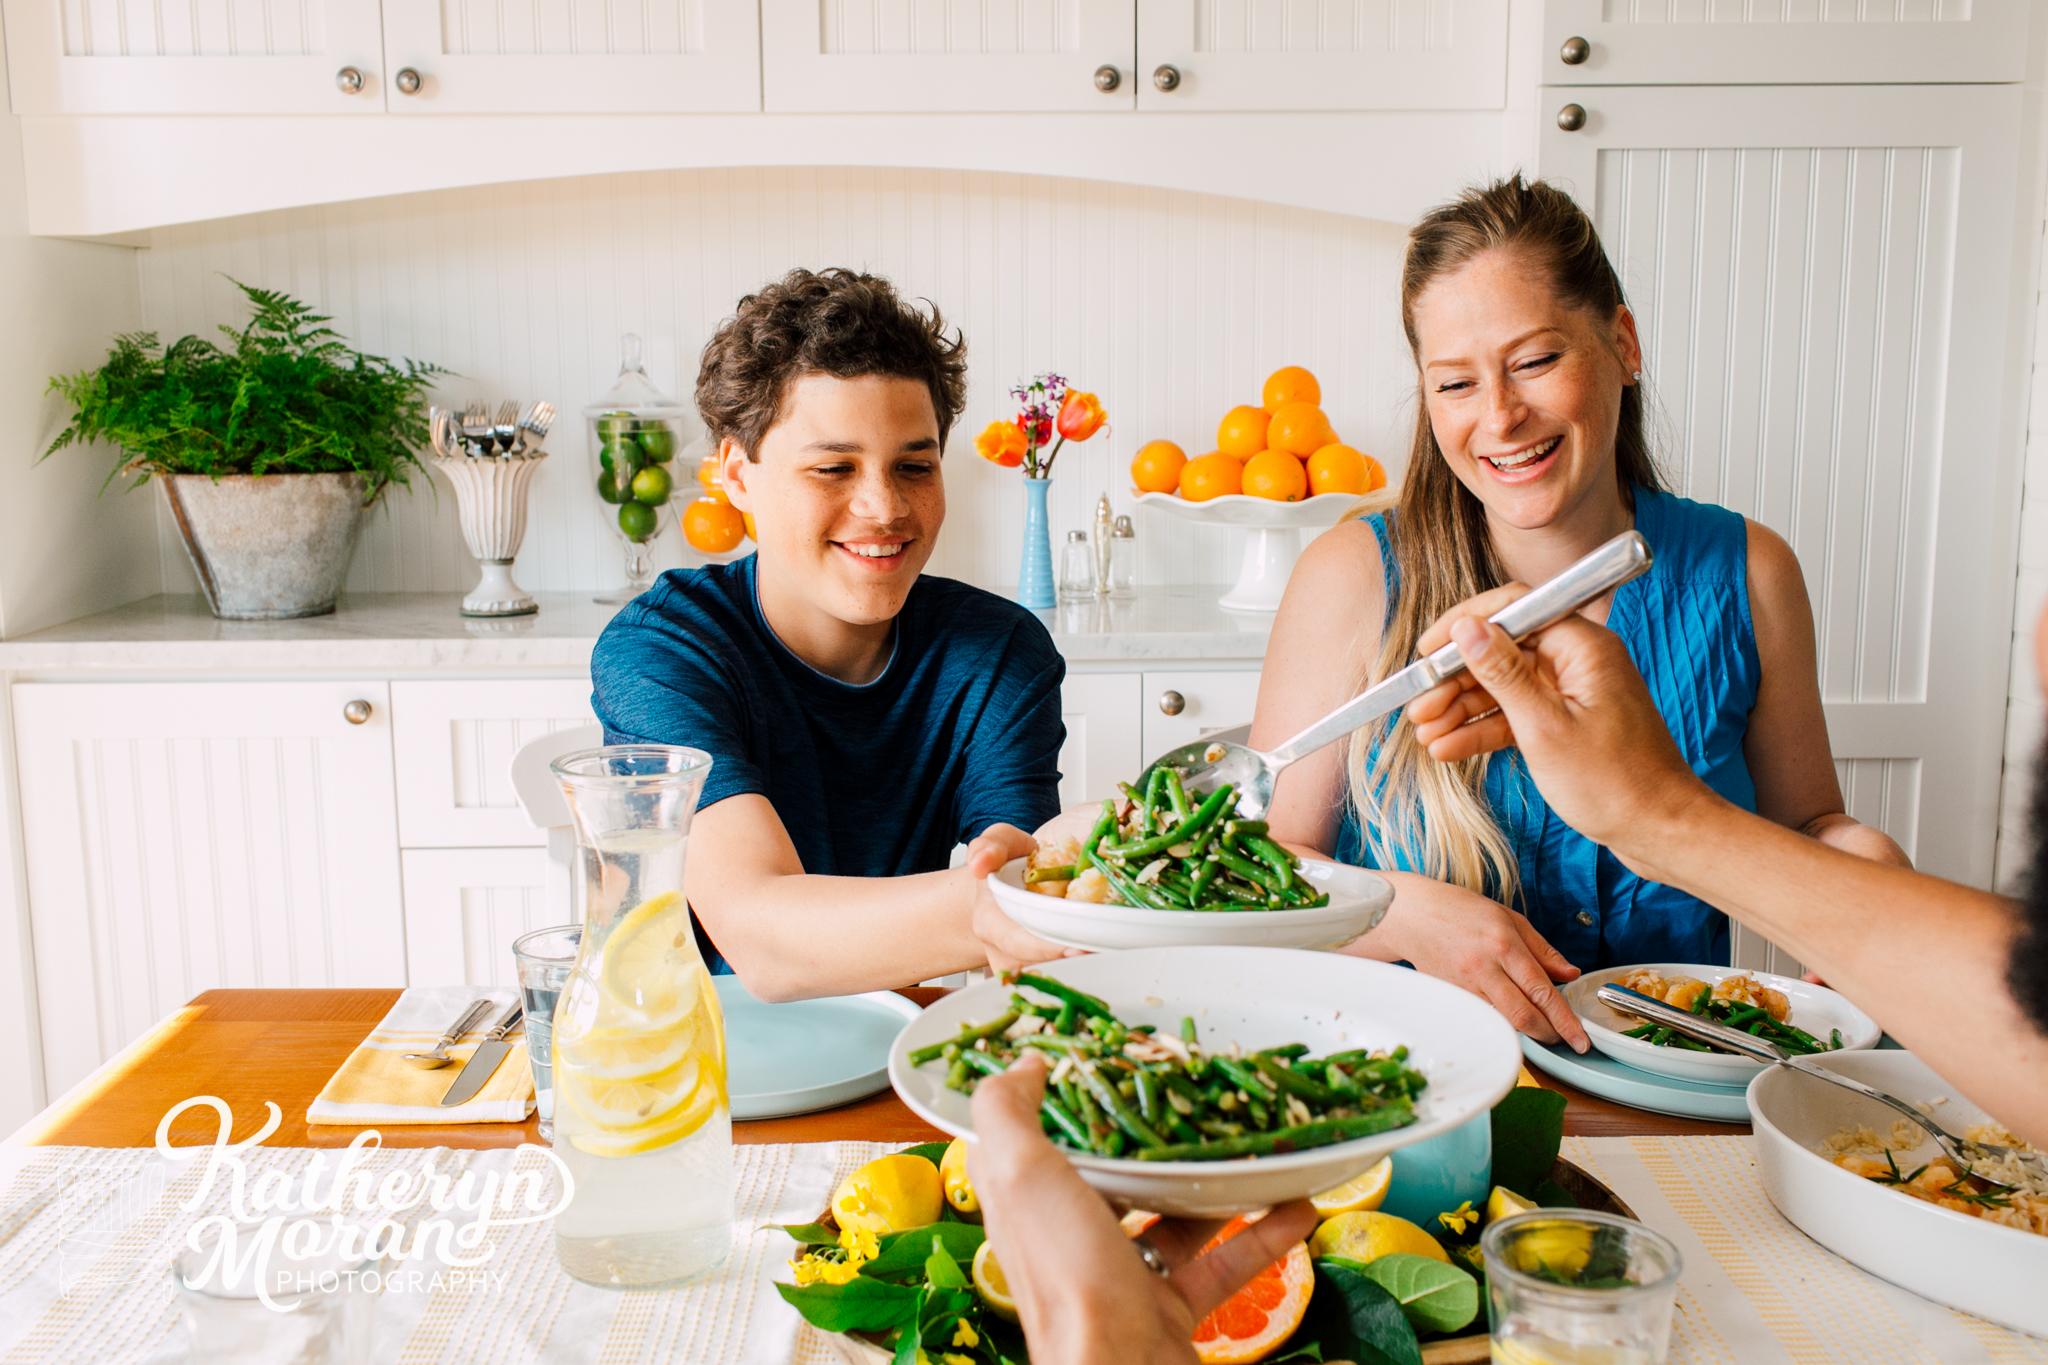 dream-dinners-lifestyle-session-katheryn-moran-2019-9.jpg